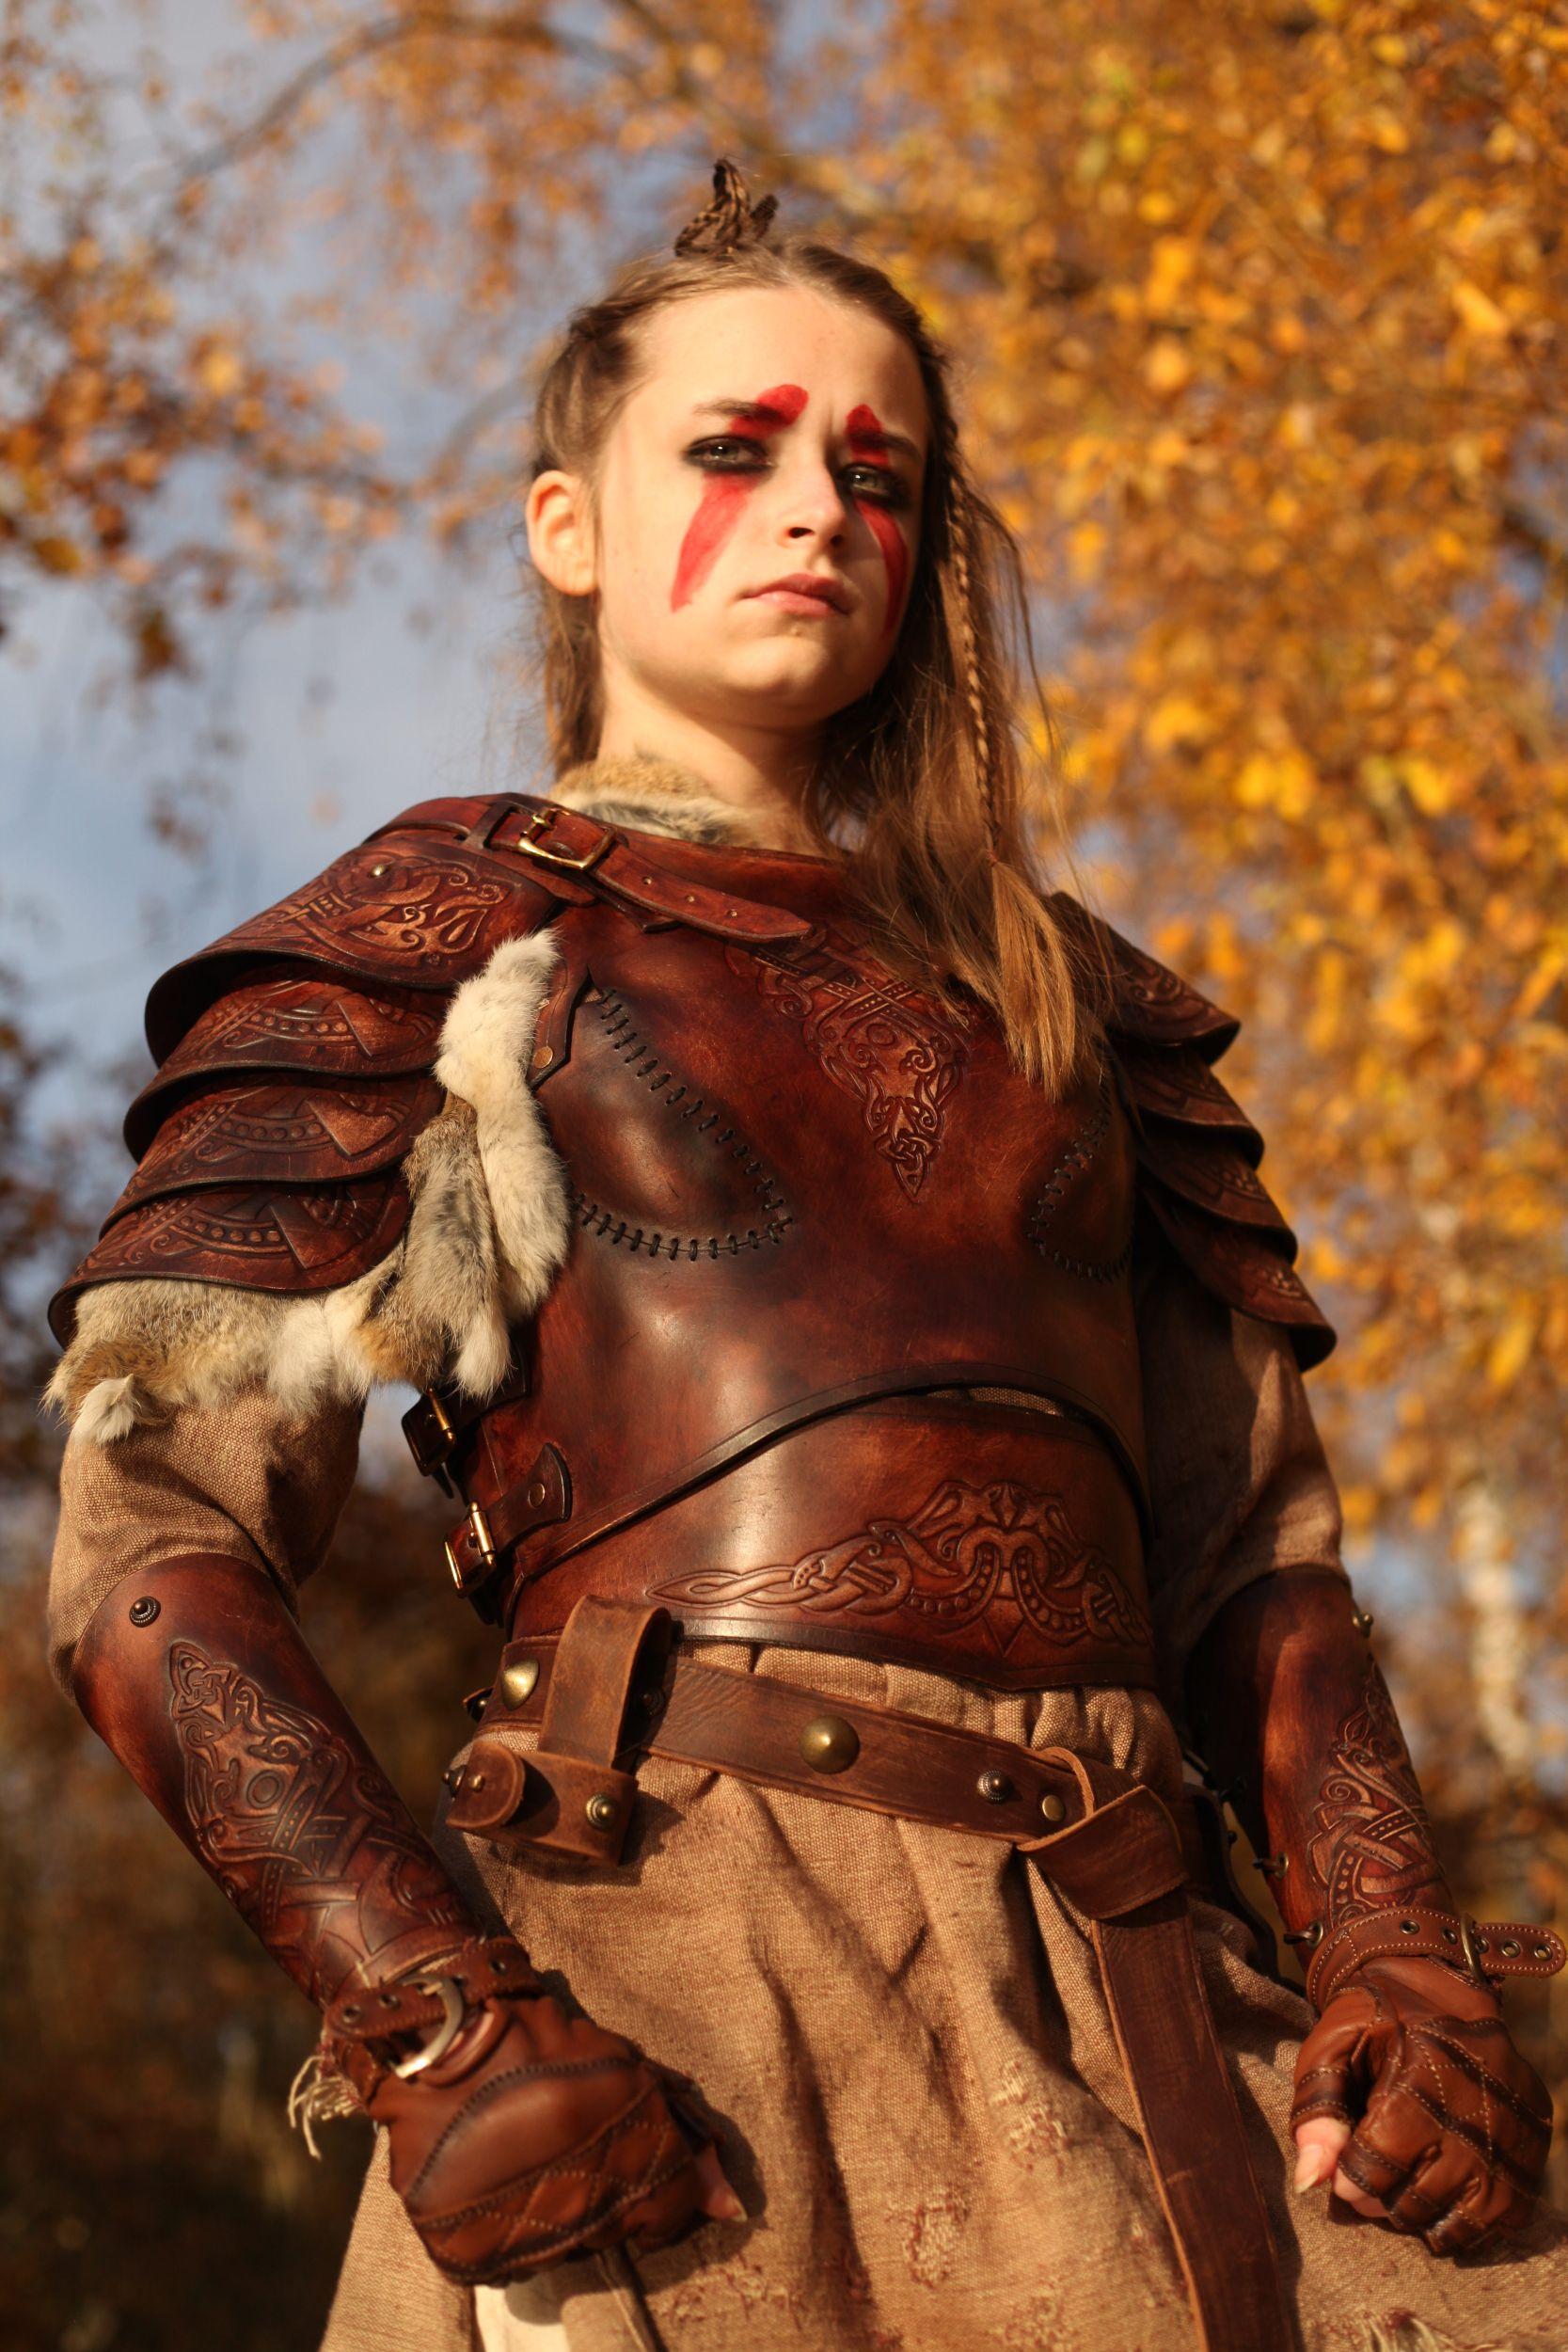 larp-komplettoutfit-wikinger-schildmaid-stl-304915_3